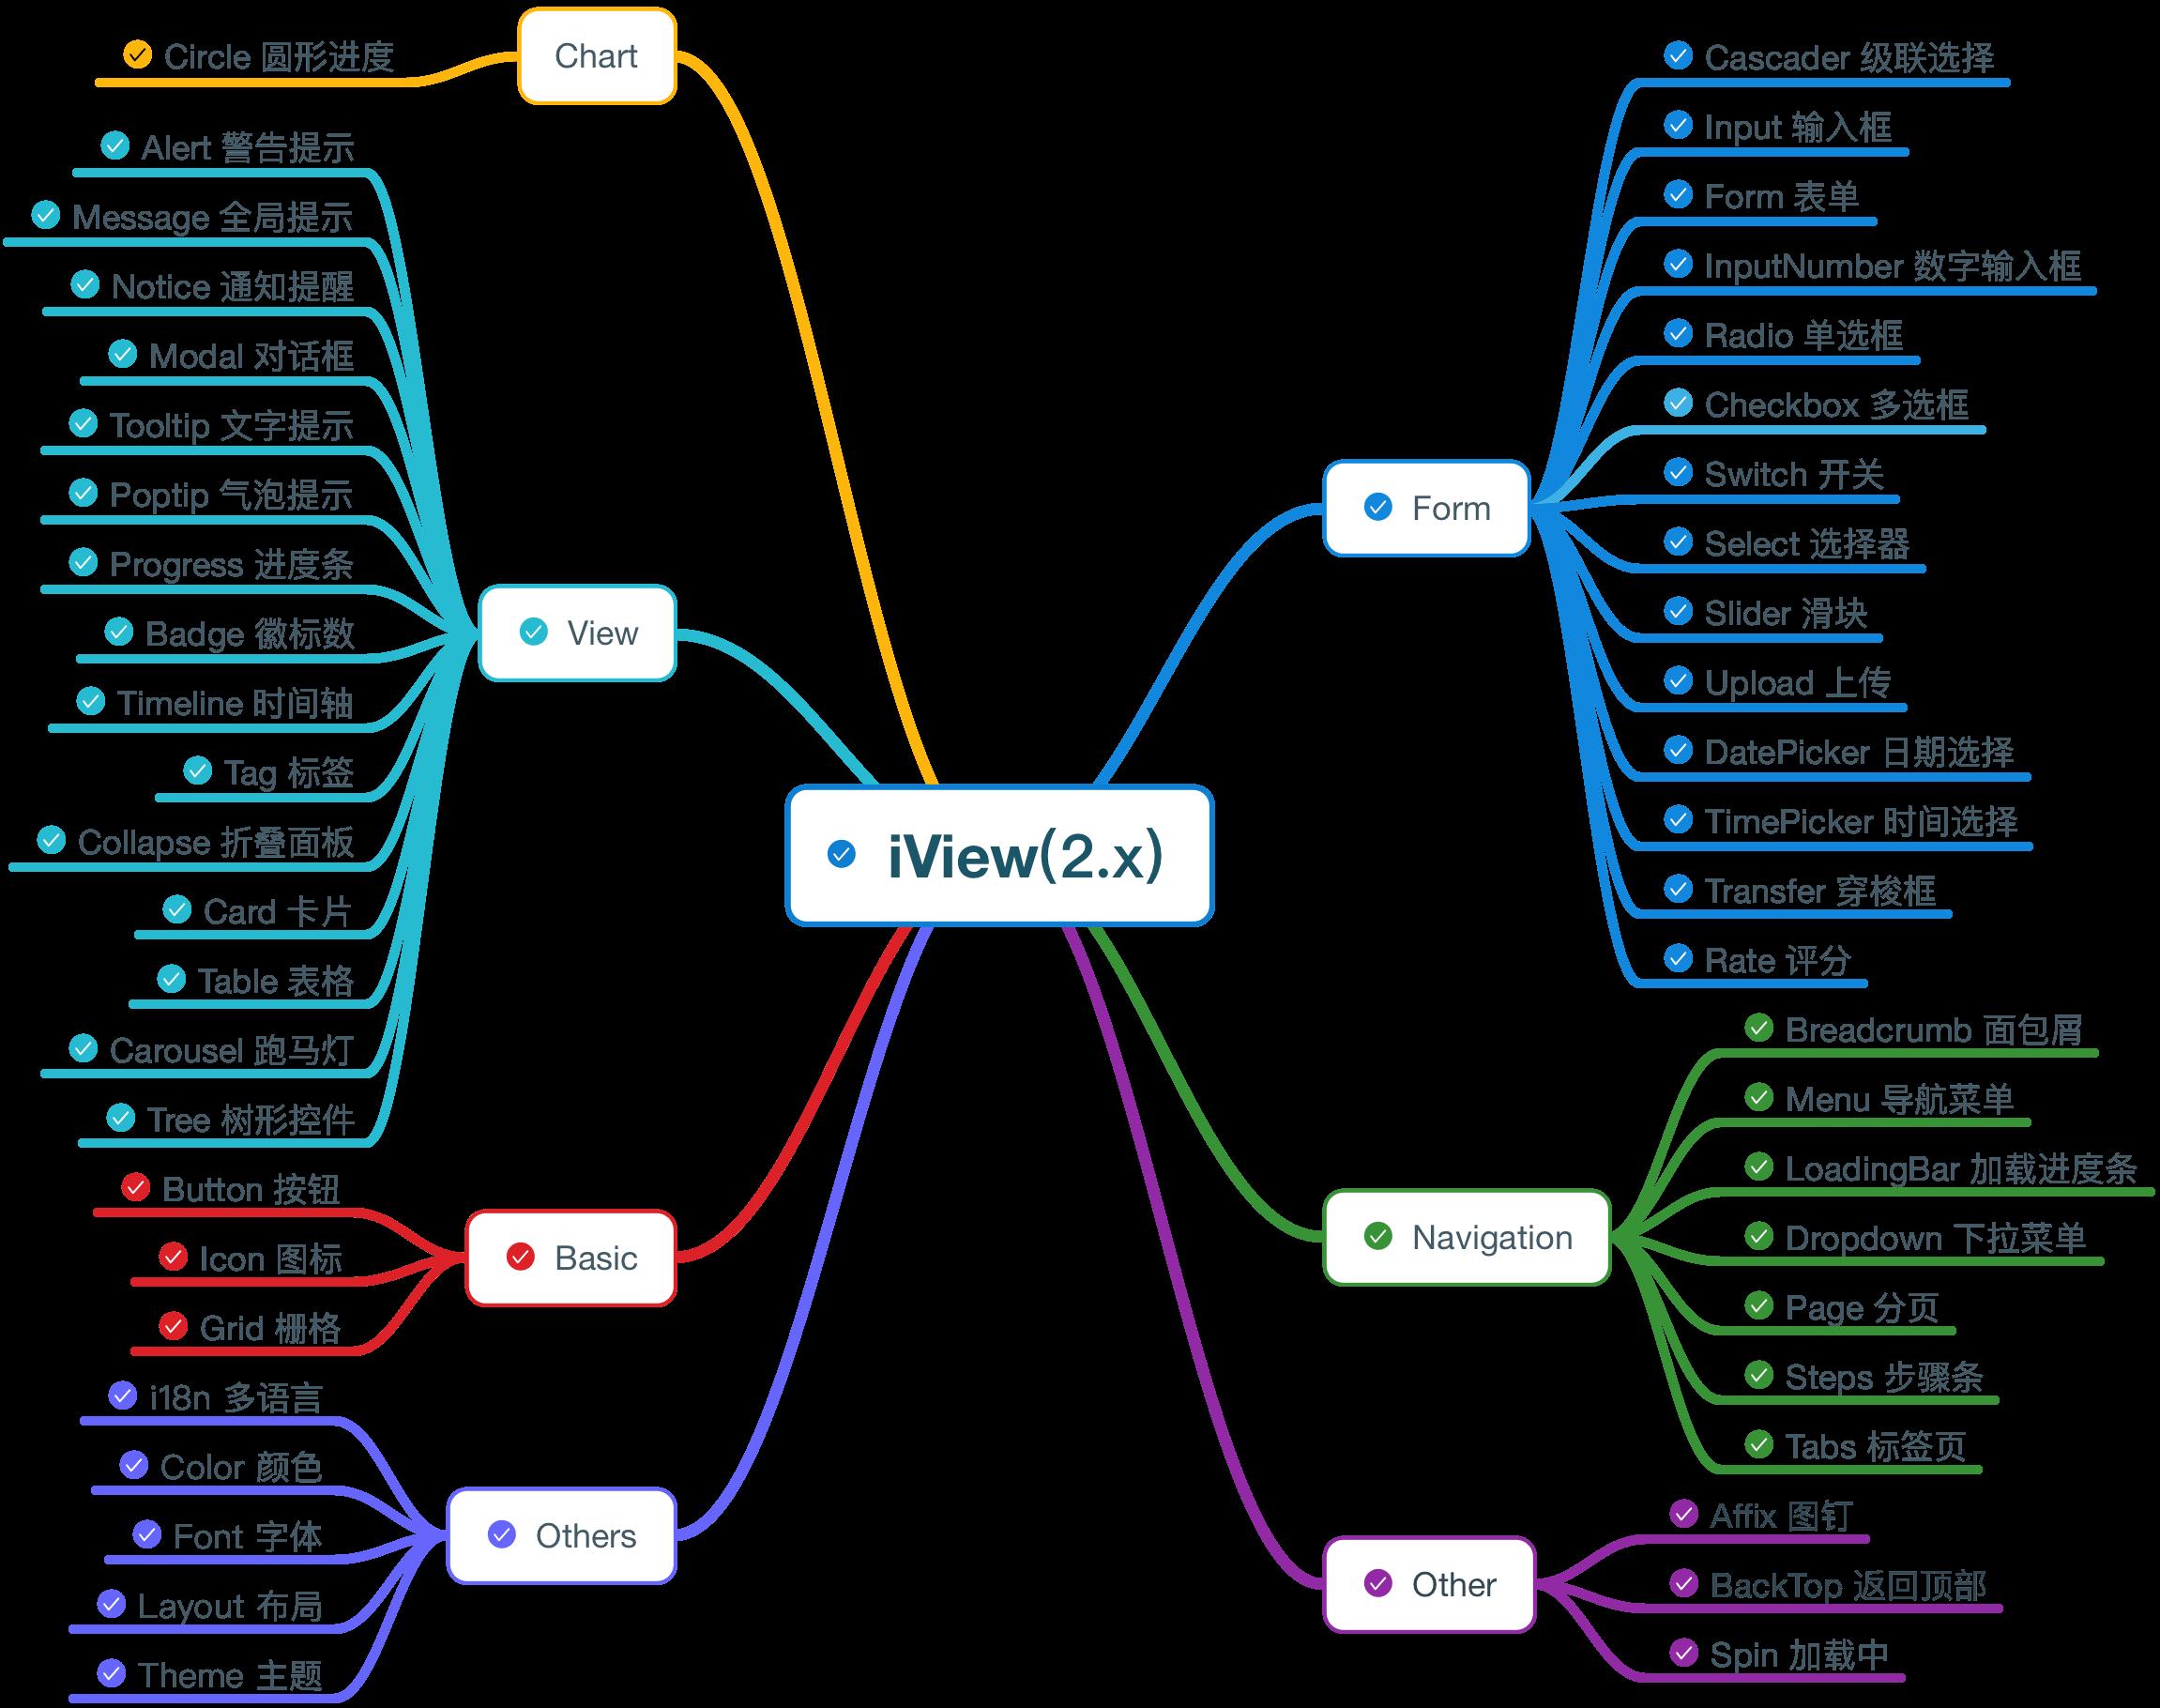 2017 JavaScript 开发者的学习图谱 | 码云周刊第 25 期-Gitee 官方博客